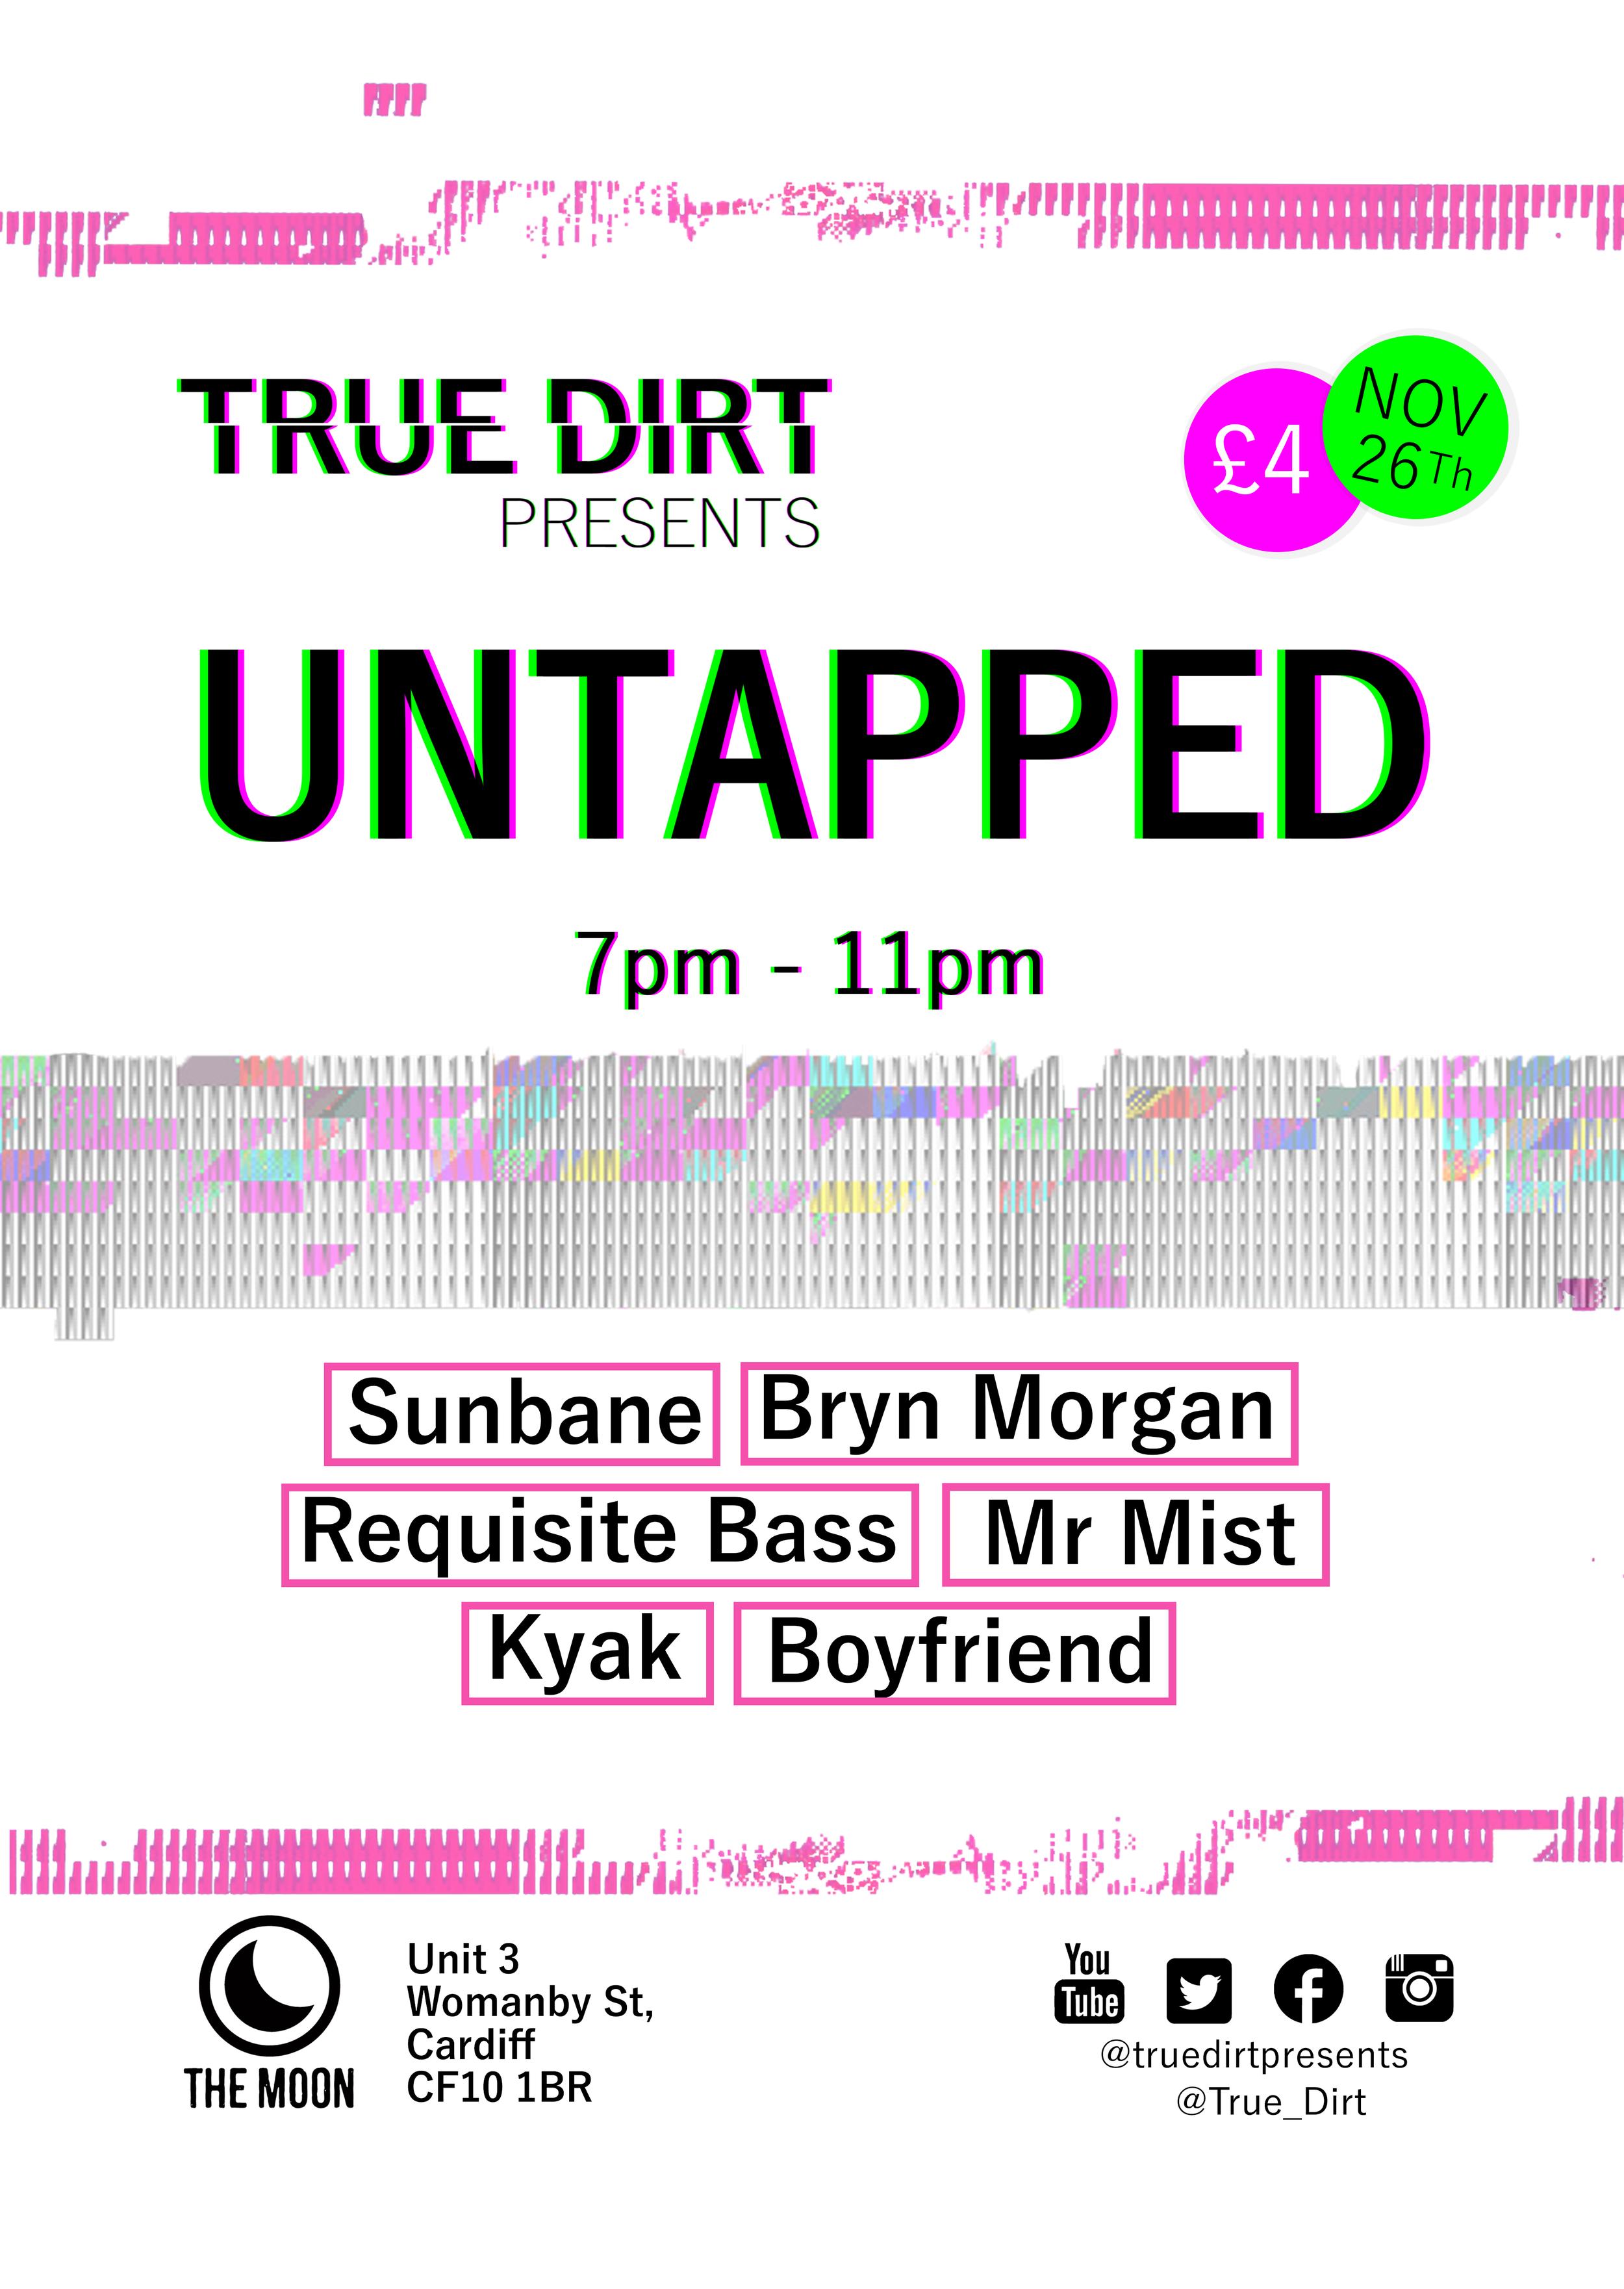 True Dirt presents Untapped